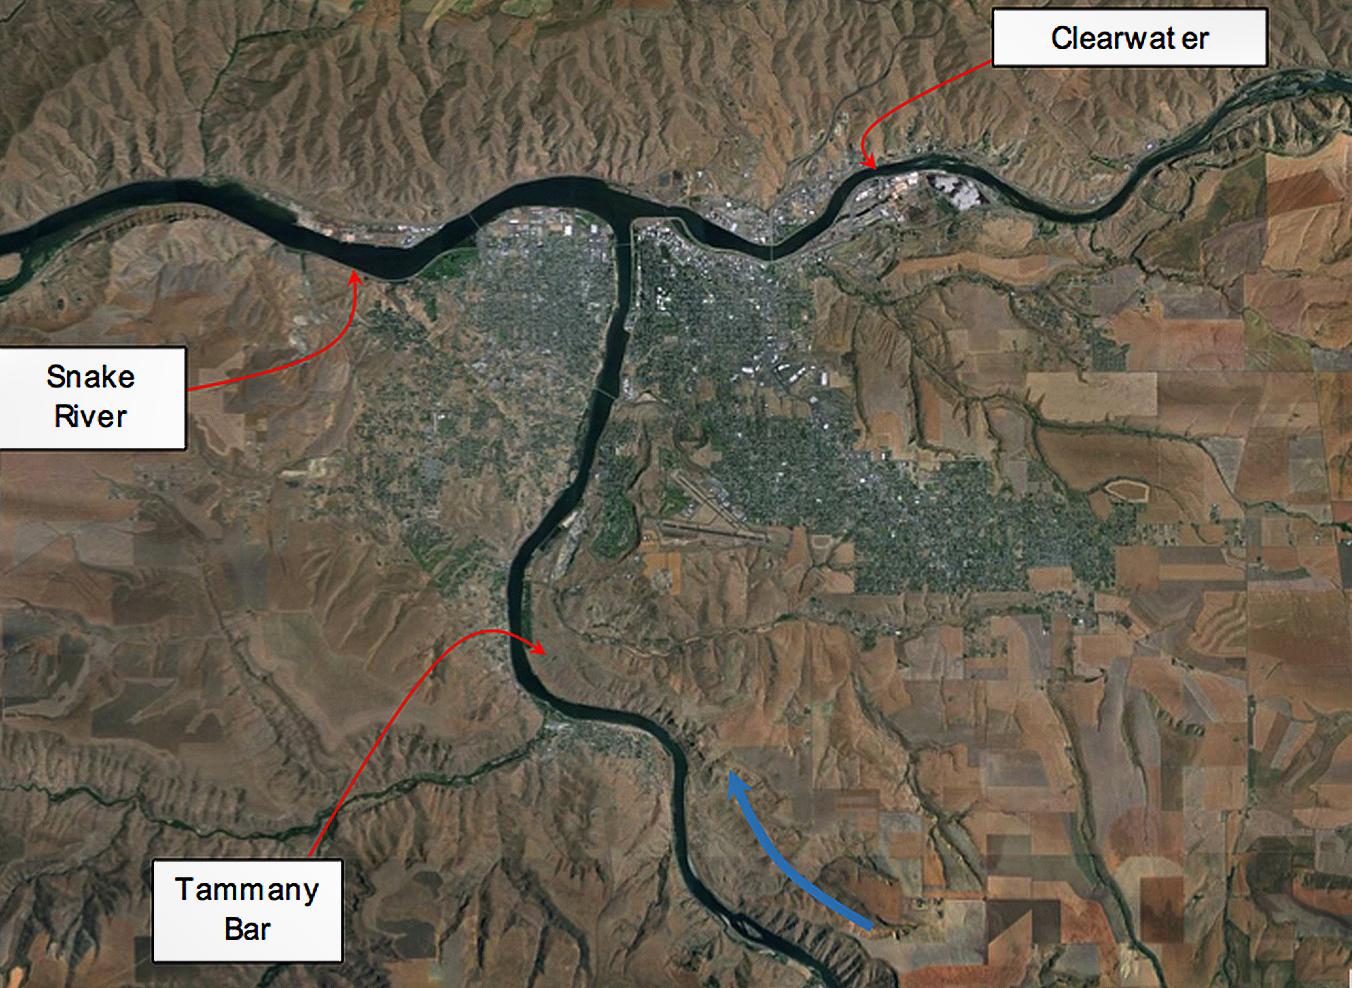 Tammany Bar, Bonneville Flood, Missioula Flood, San Bar, Scale Invariance, Geology , Lewiston, Idaho, Snake, Clarkston, Washington, River, Hell's Canyon